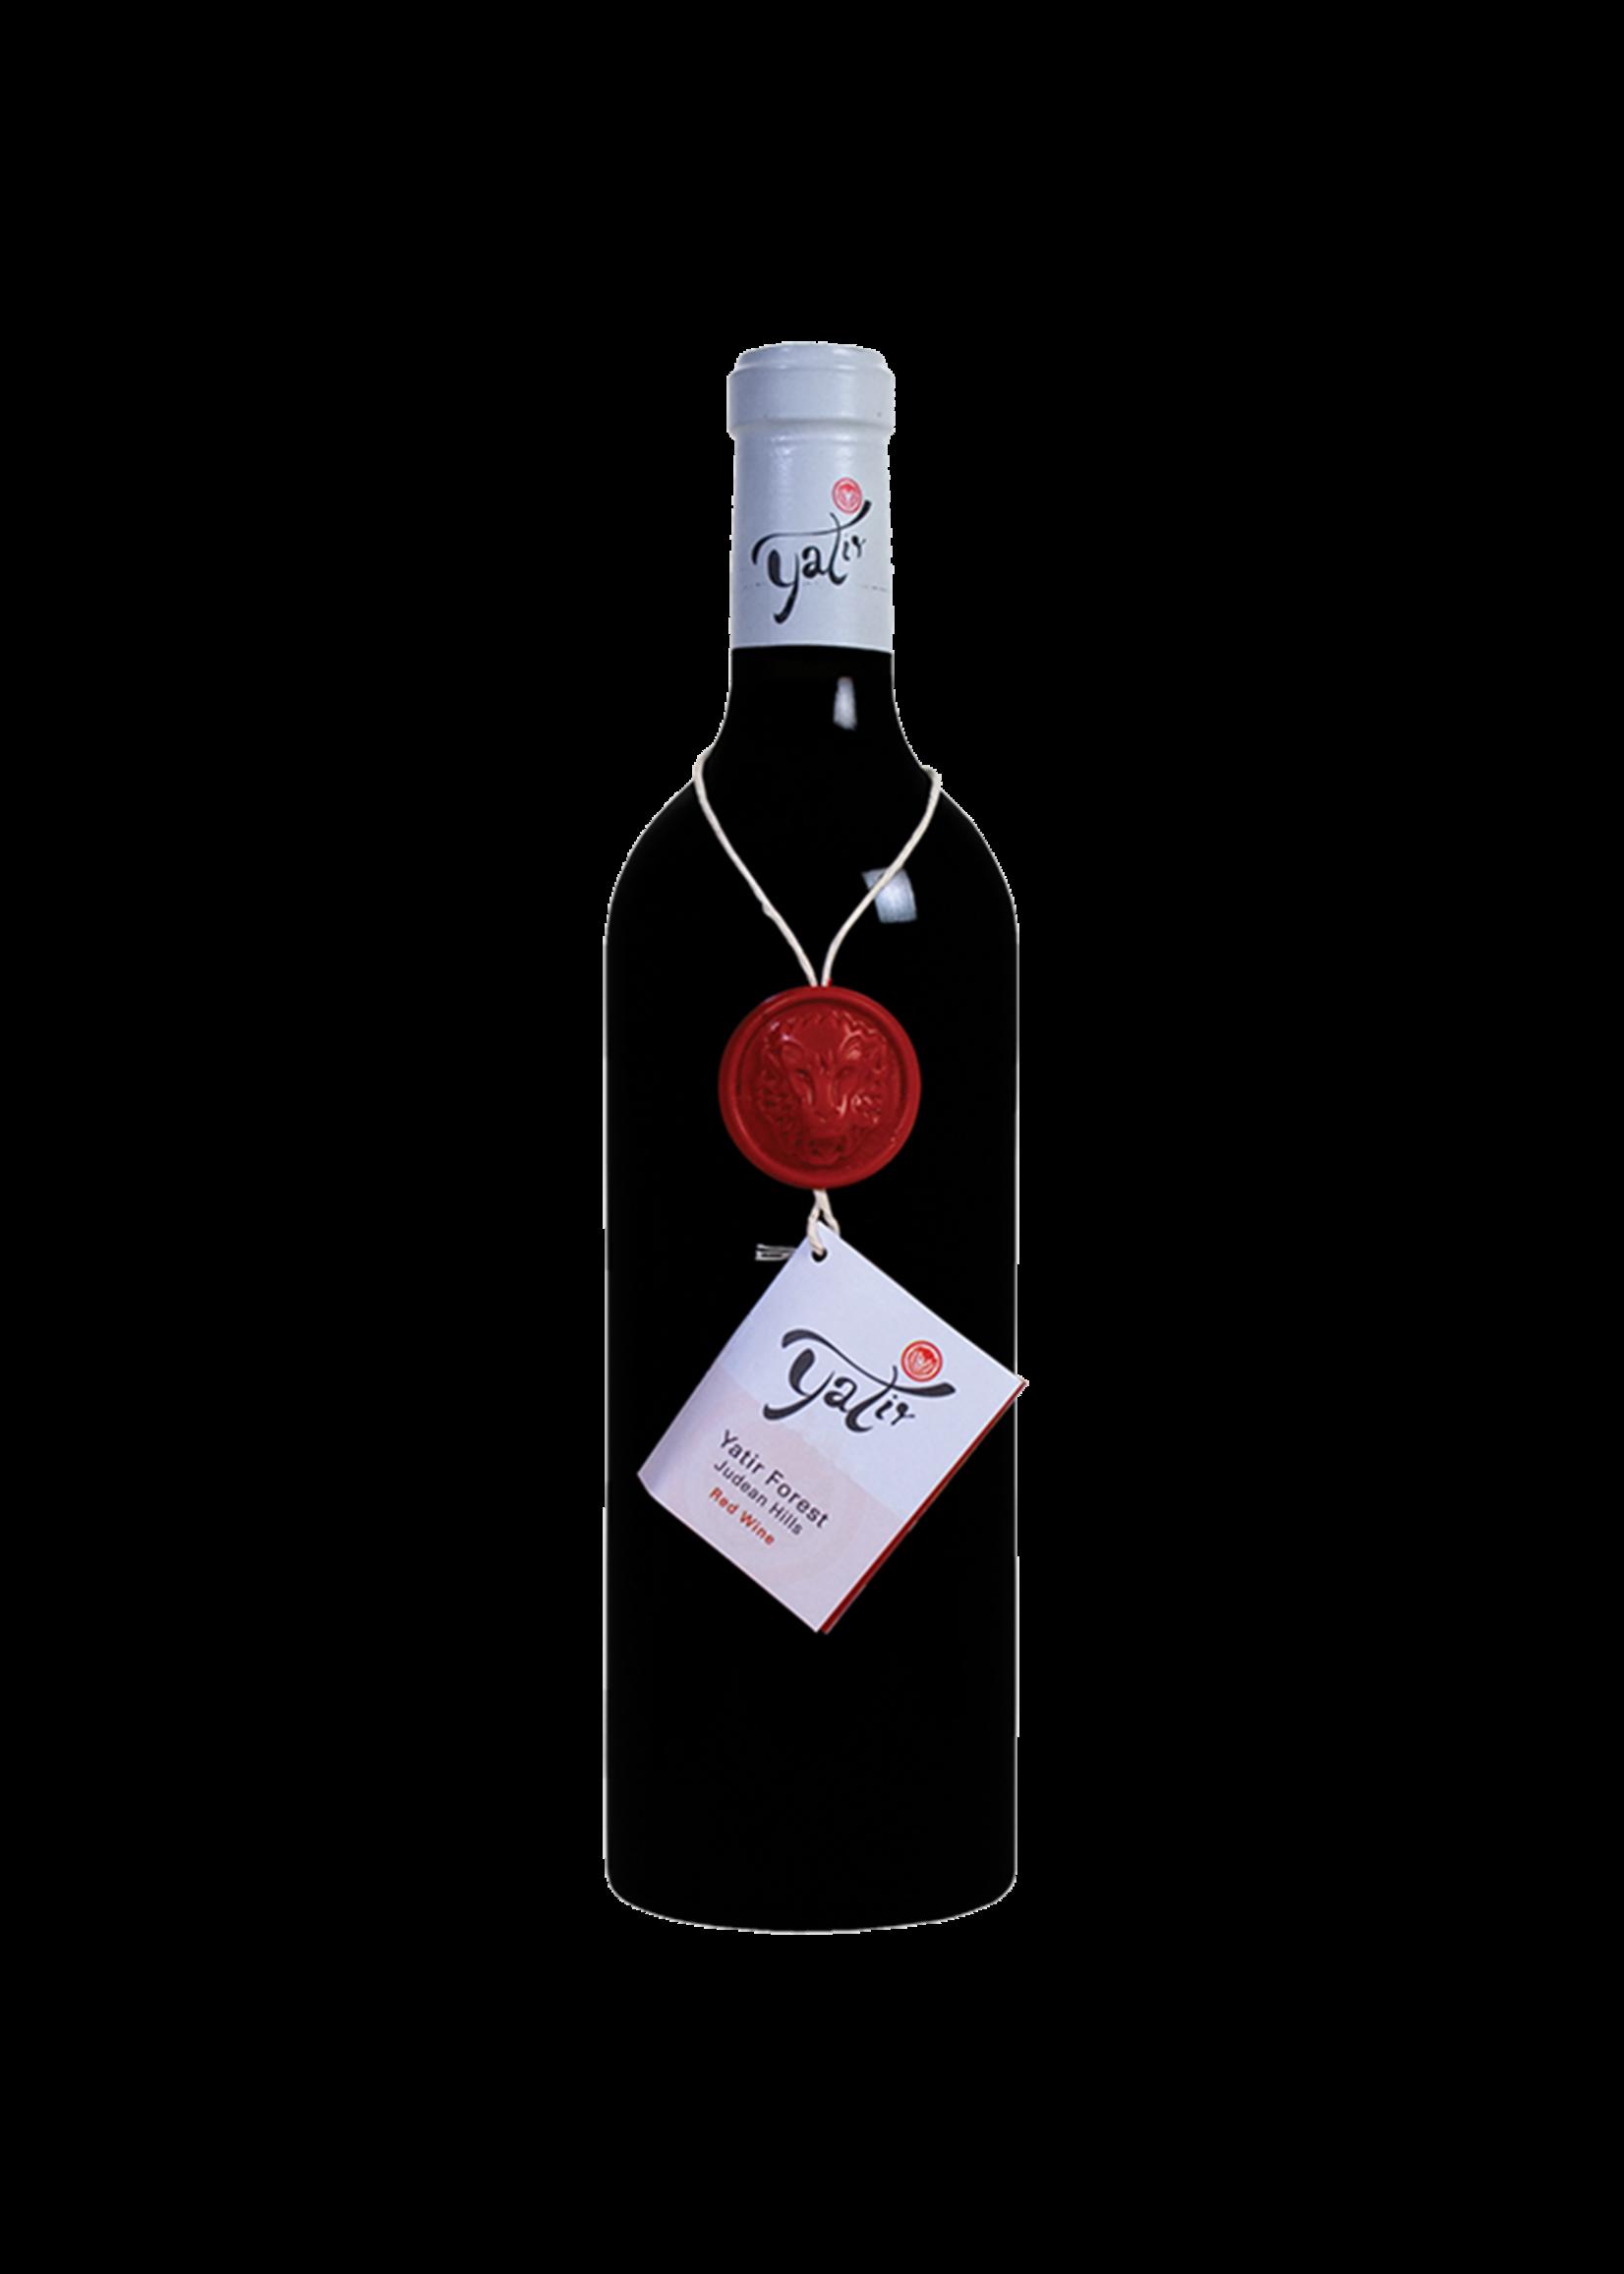 Carmel Winery Carmel Winery / Yatir Forest Judean Hills Red Blend / 750mL